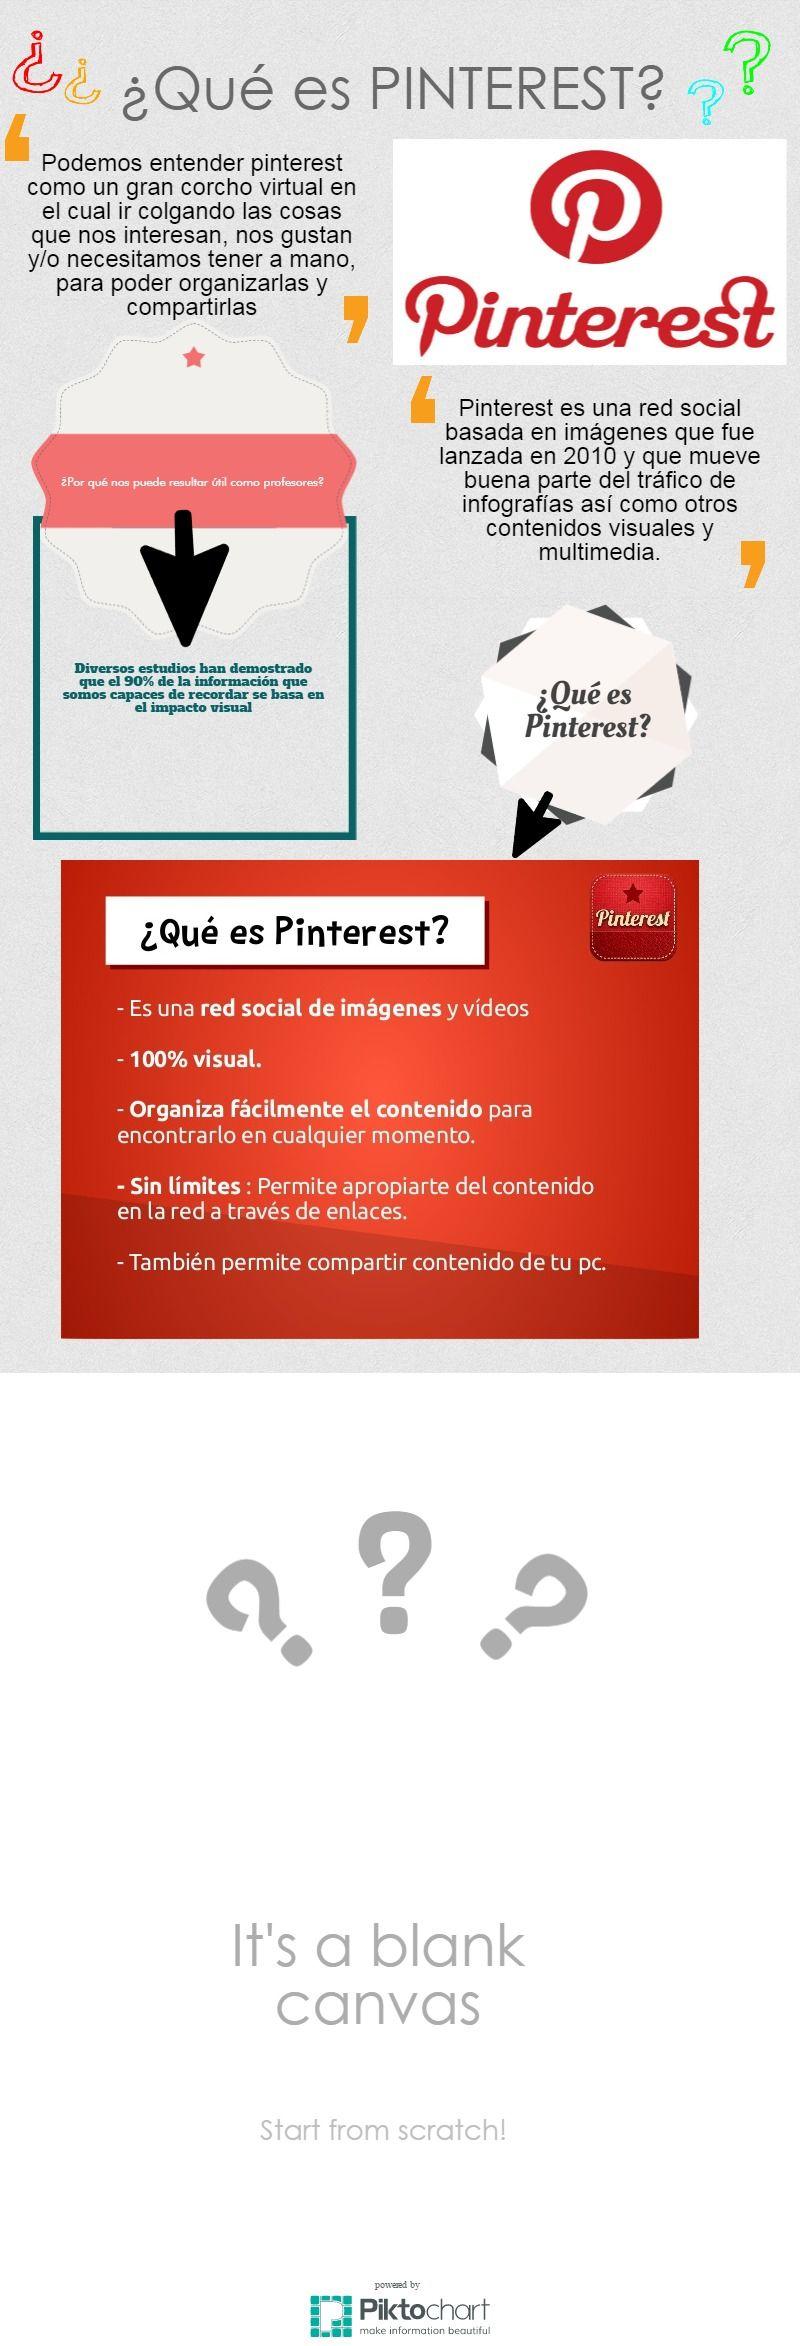 ¿Qué es Pinterest? | @Piktochart Infographic